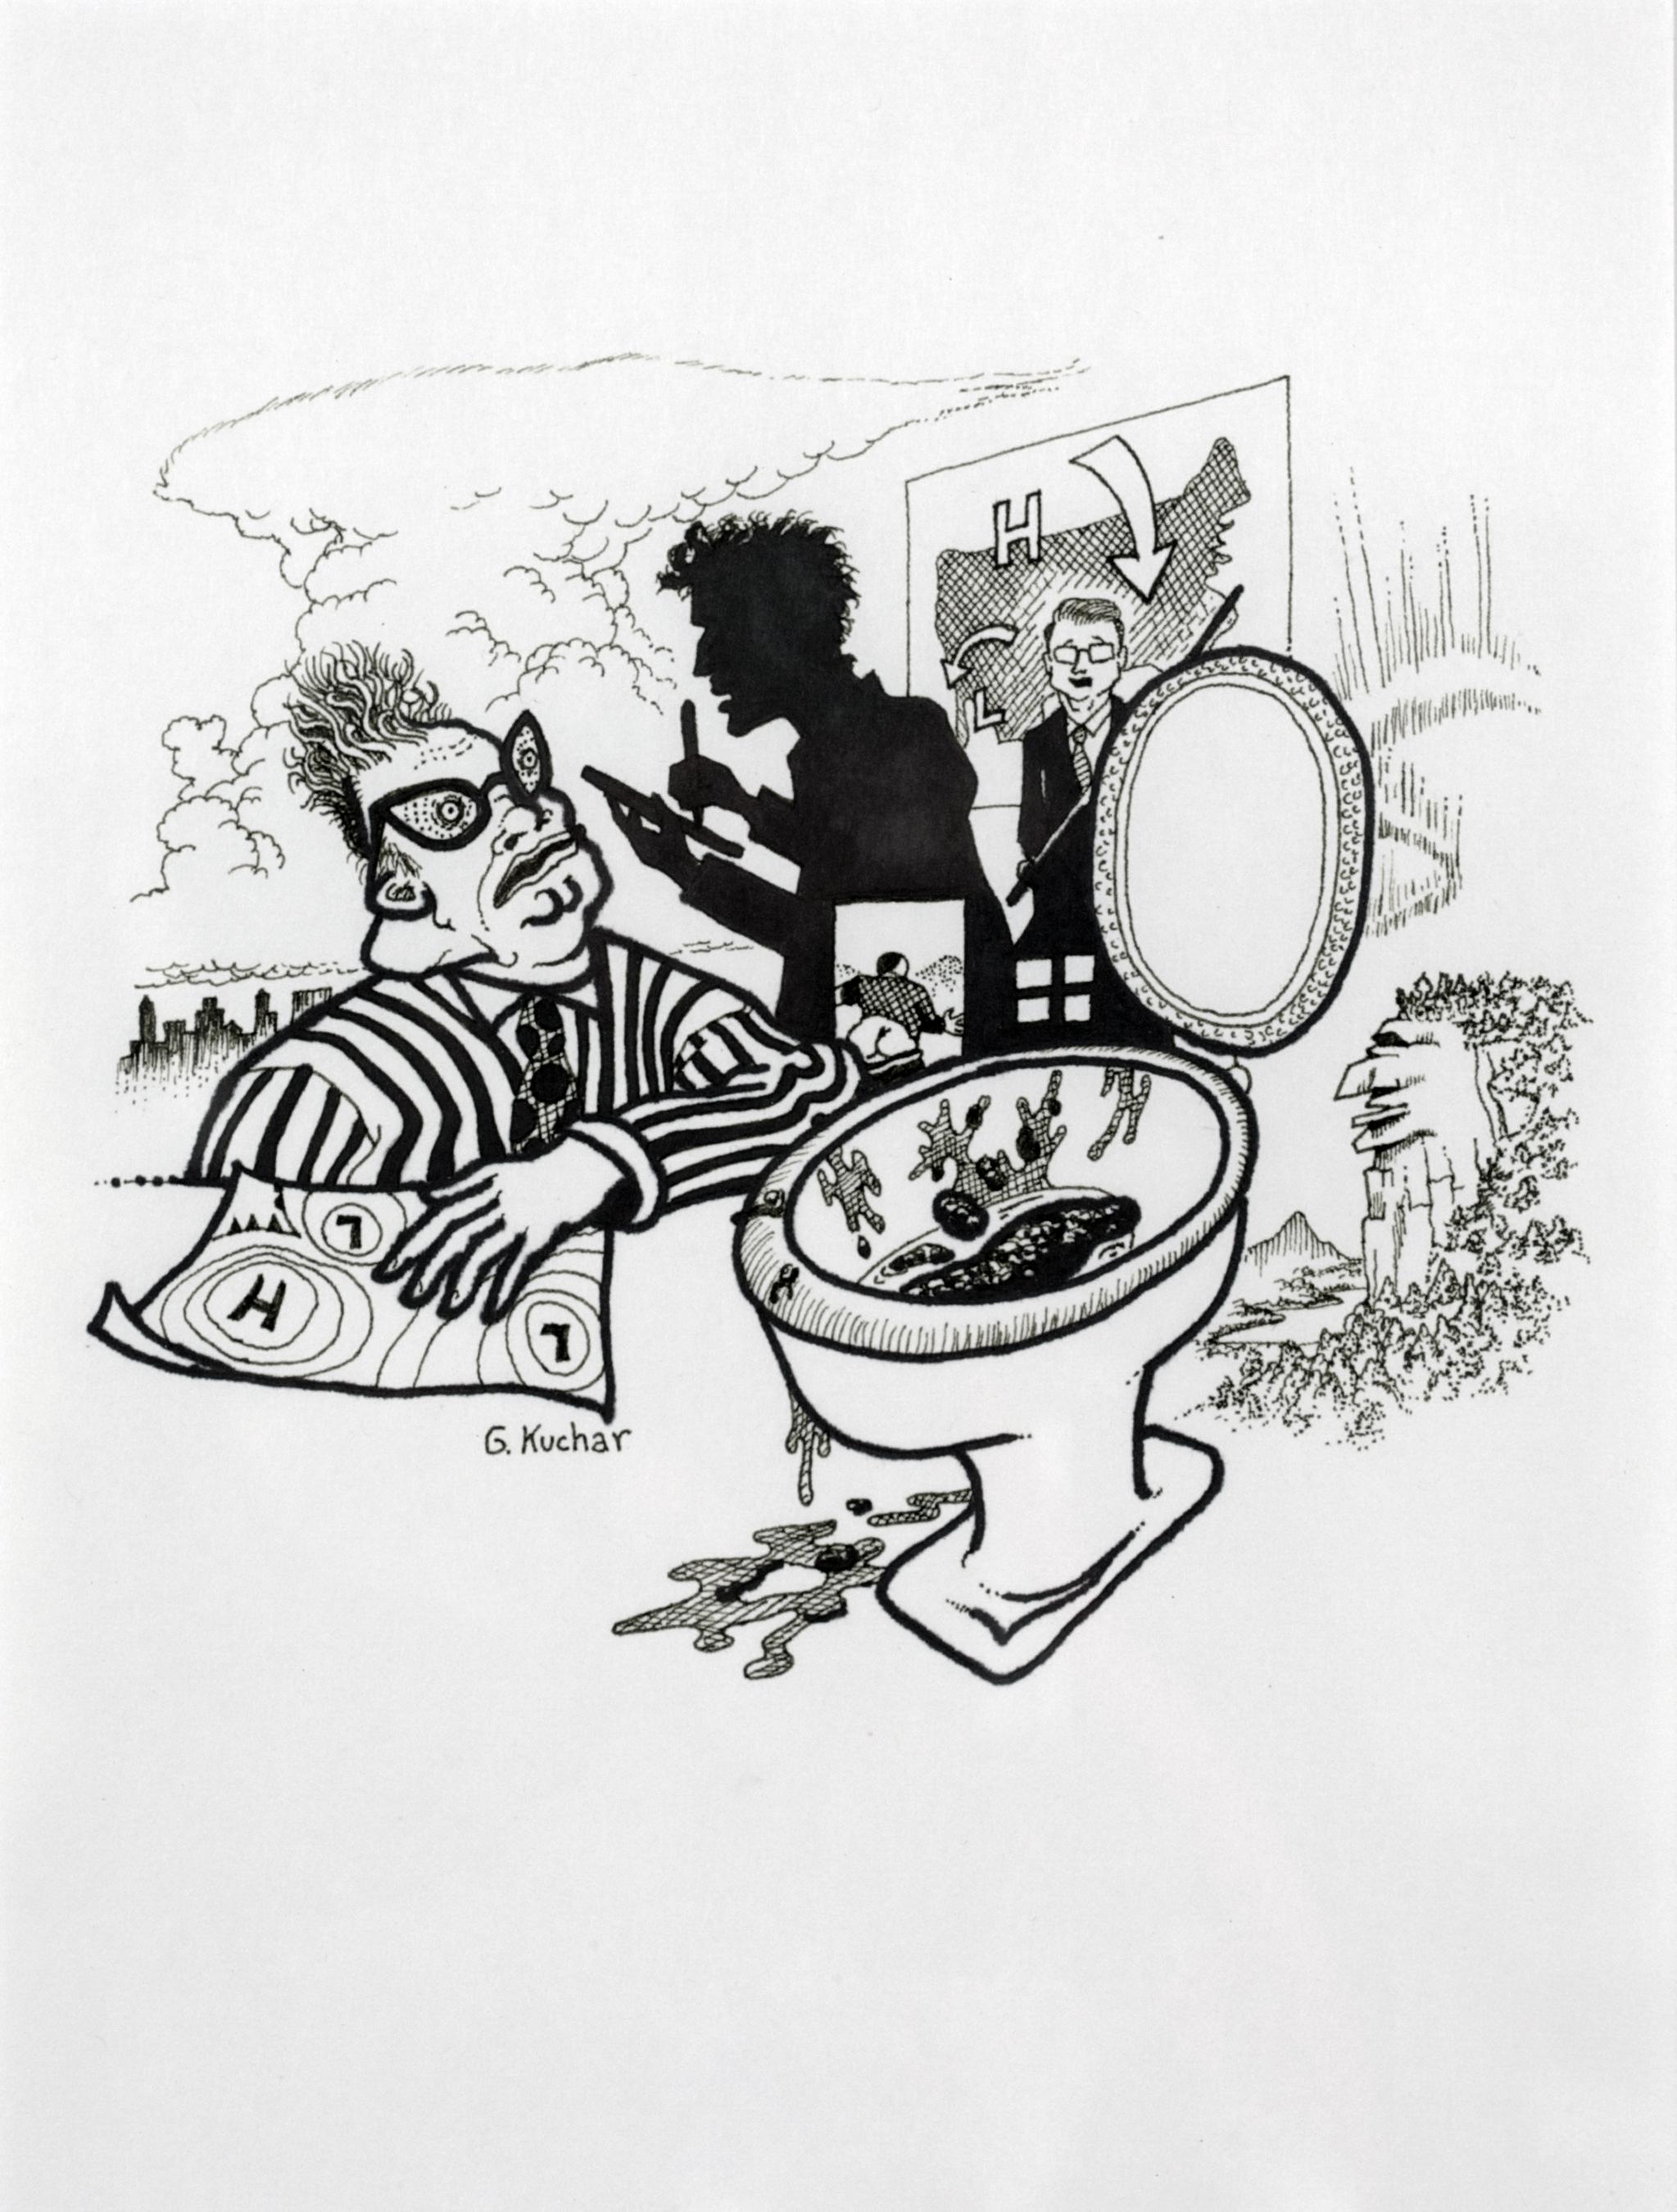 George Kuchar,  Livid Lumps , 1996, ink on paper, 12 x 9 inches, © Kuchar Brothers Trust.